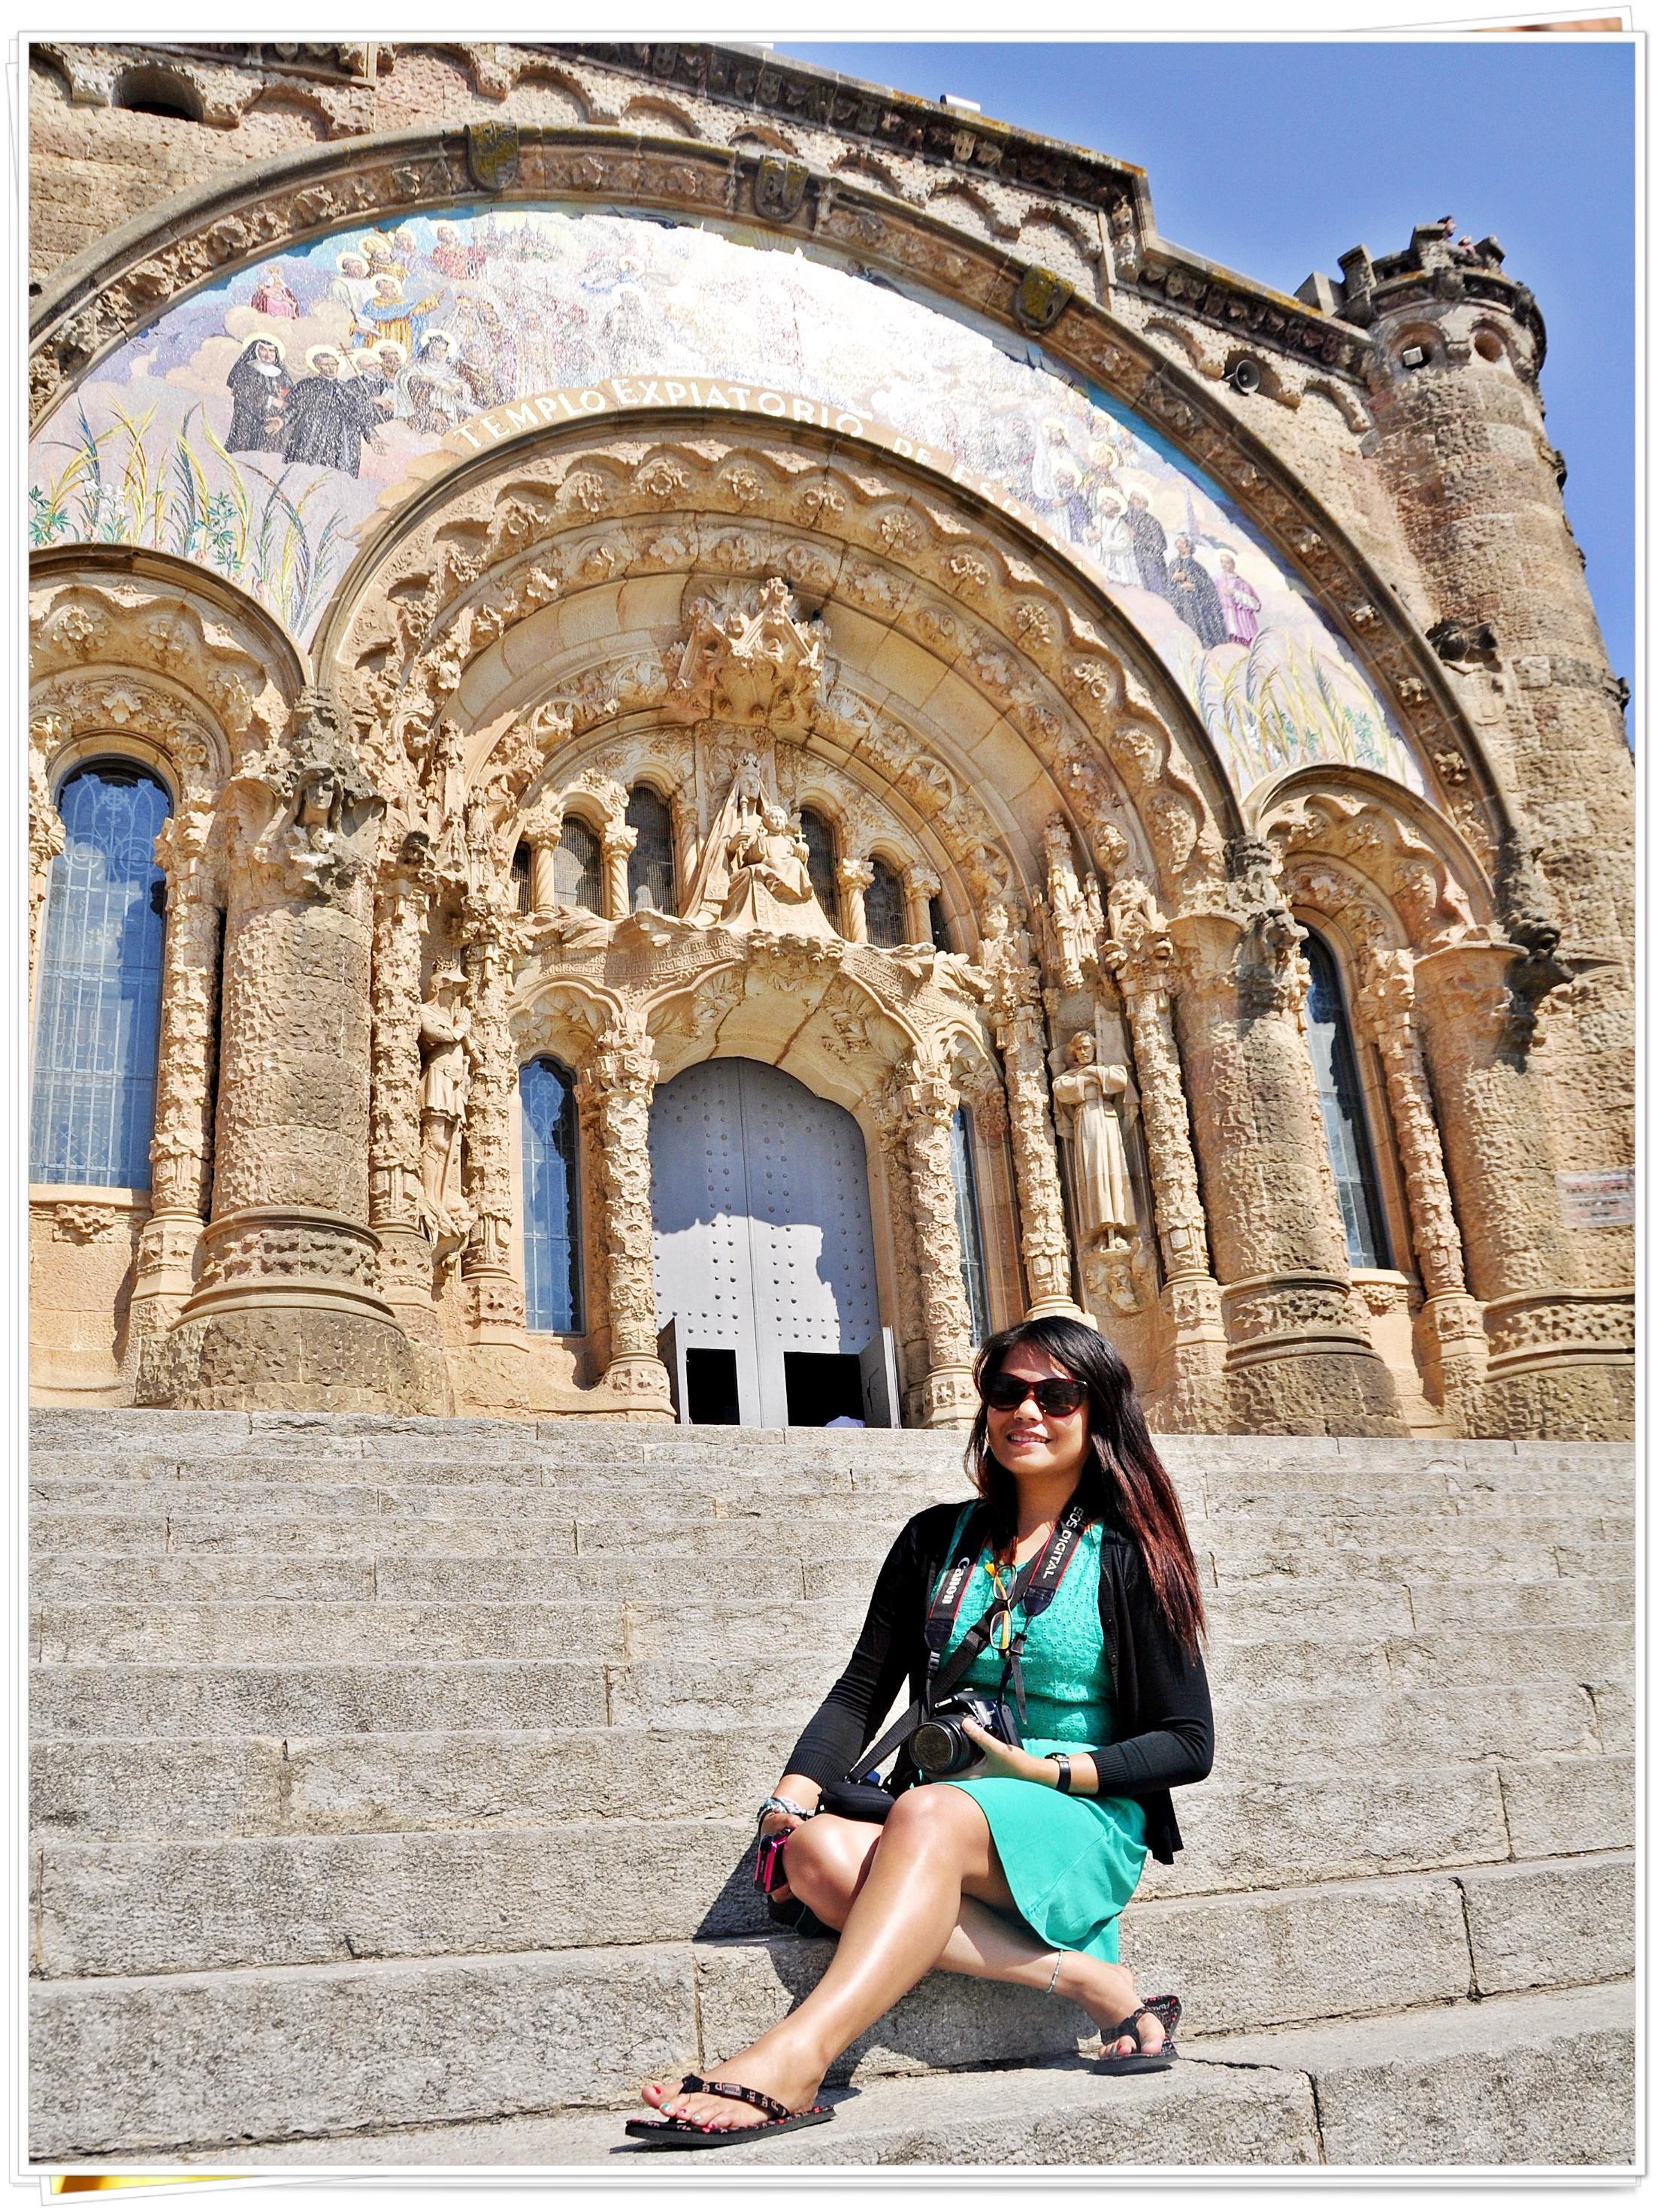 Temple Expiatori del Sagrat Cor, Tibidabo - Barcelona, Spain 2013